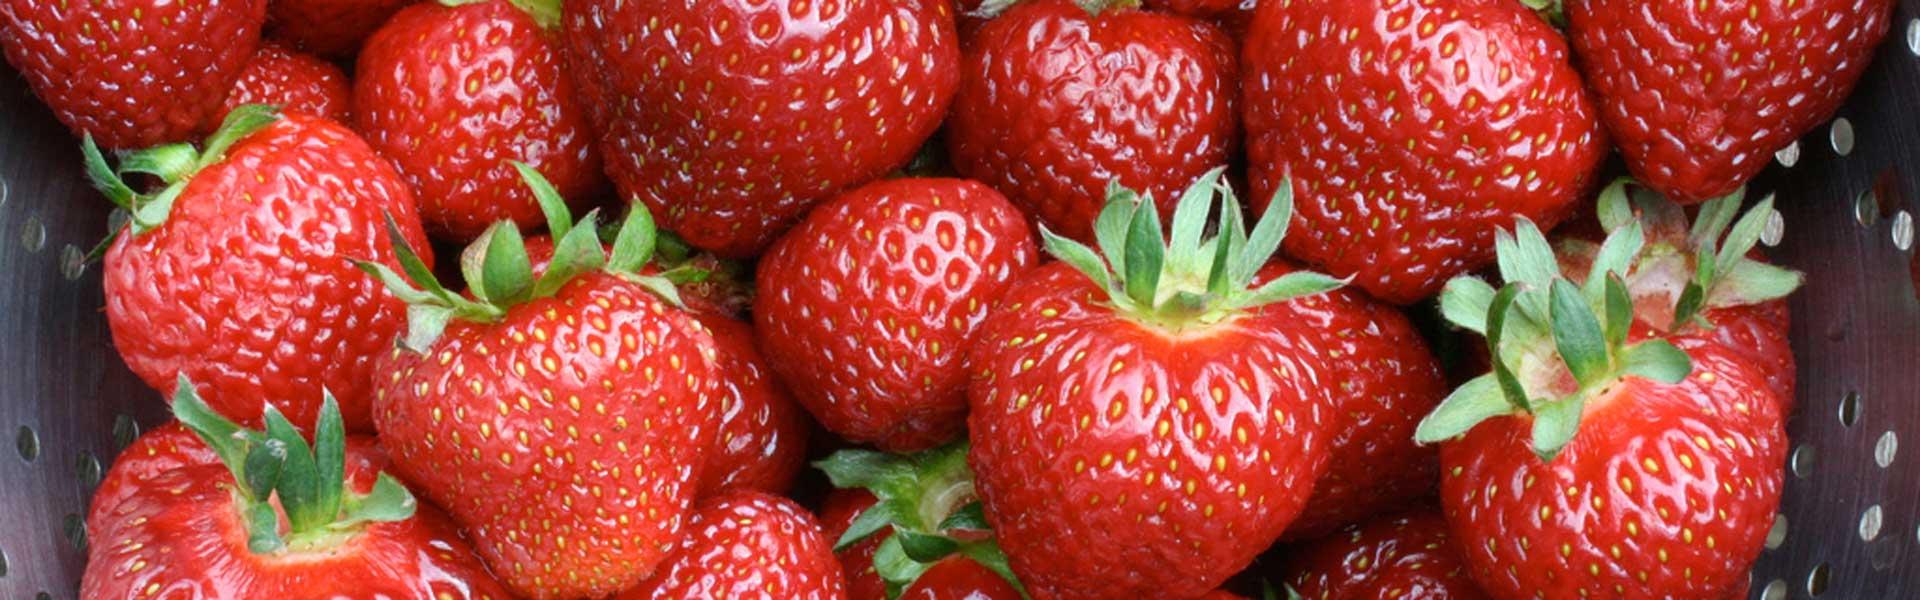 8476-red-strawberries